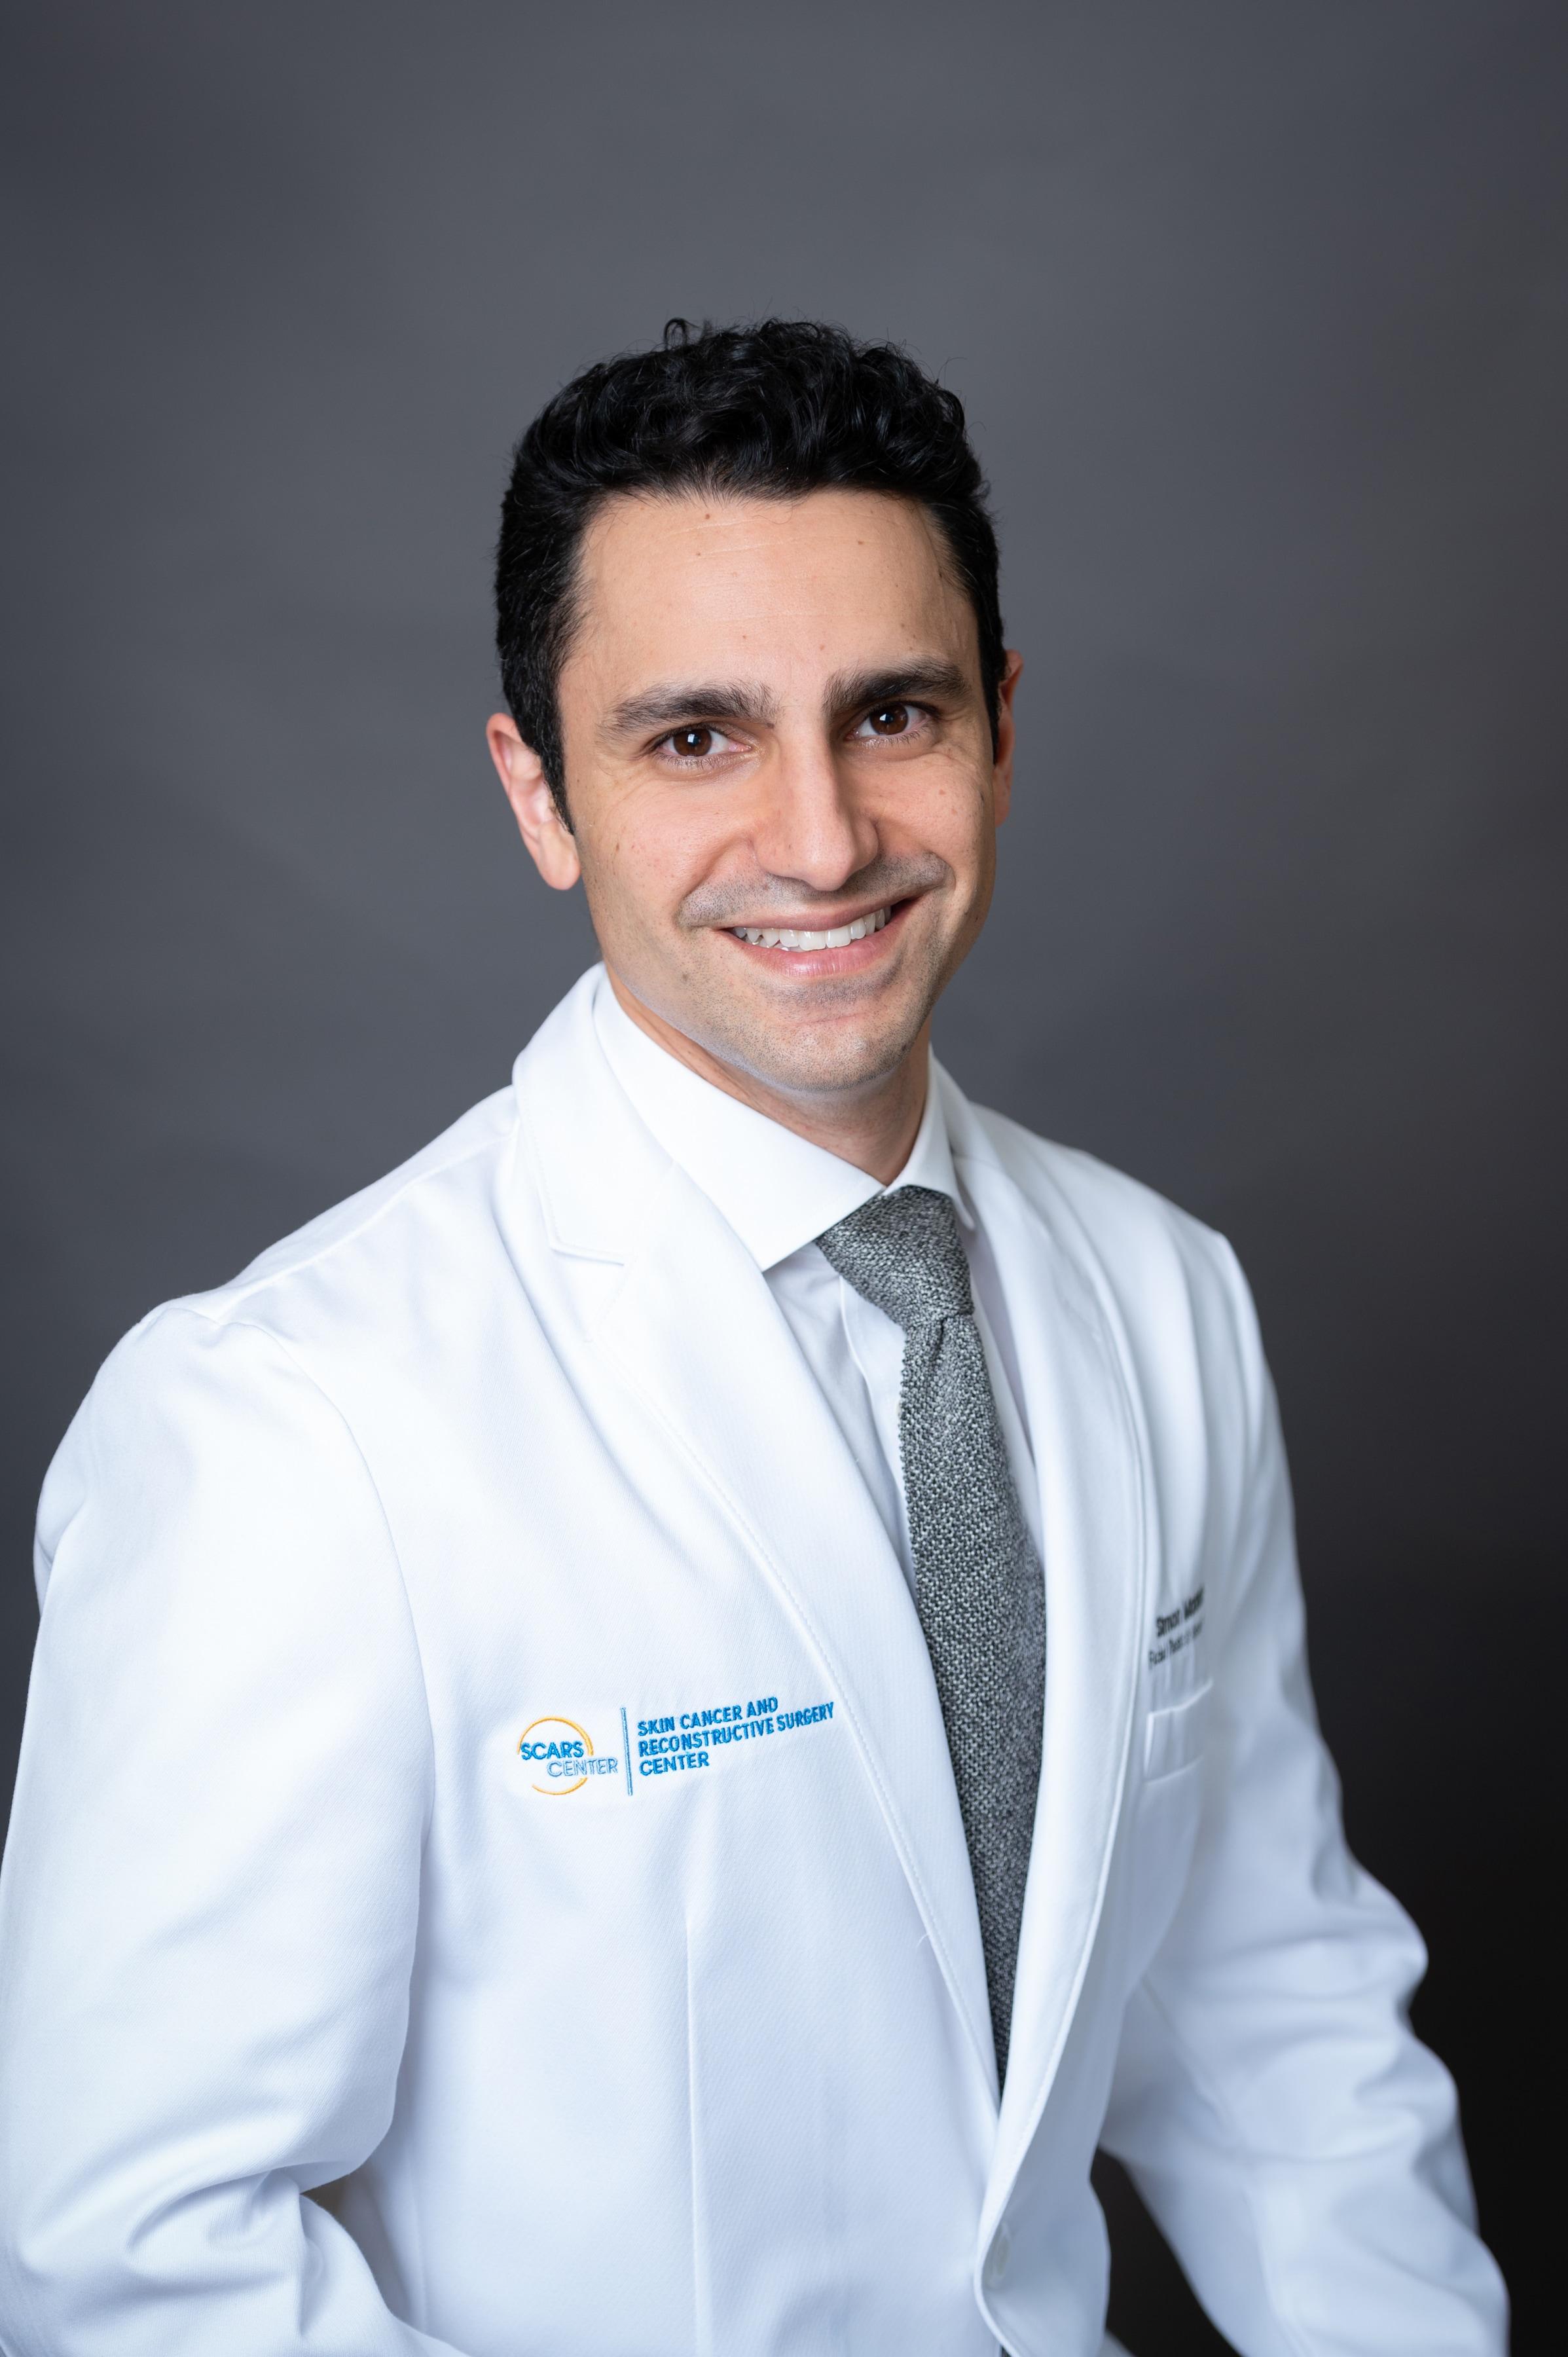 Dr. Justin Karlin MD, MS